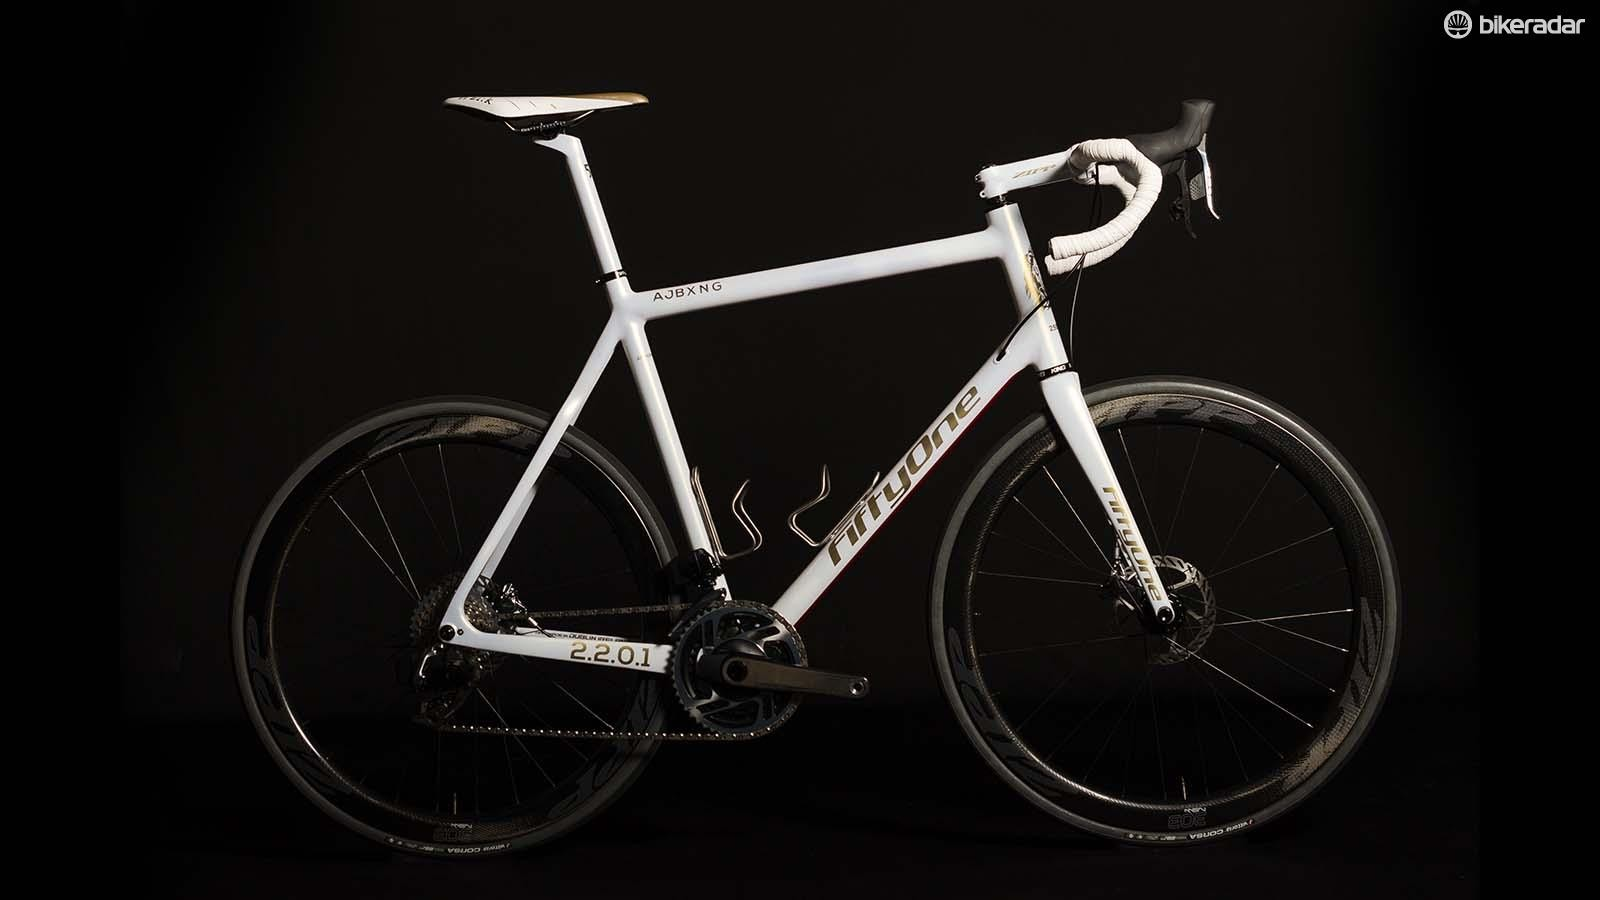 Anthony Joshua's custom bike from frame builders FiftyOne